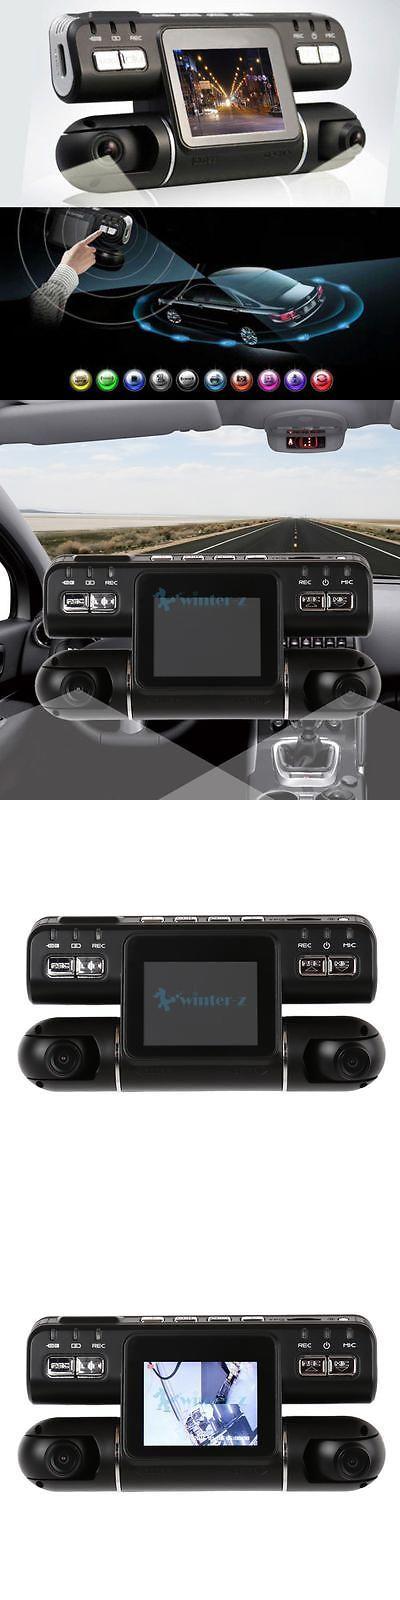 Digital Video Recorders Cards: 360° Full Hd 1080P Dual Lens 2 Car Dvr Camera Video Recorder Dash Cam G-Sensor -> BUY IT NOW ONLY: $50.99 on eBay!